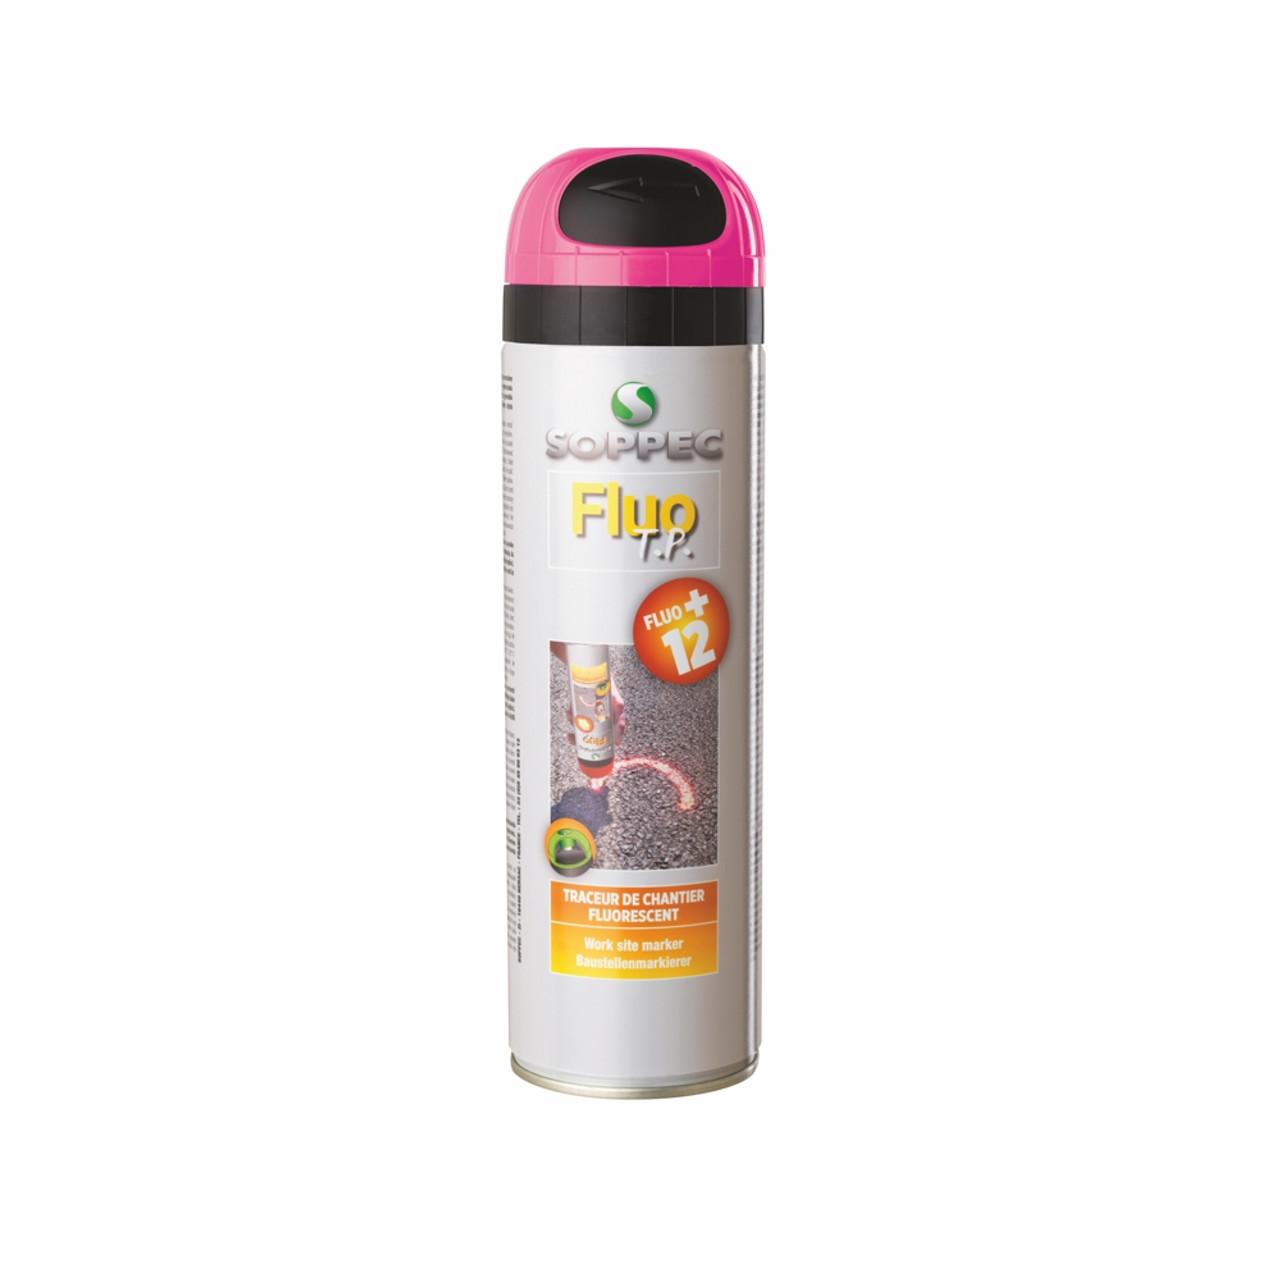 Soppec Spray Paint FluoTP Pink 500ml (910112)